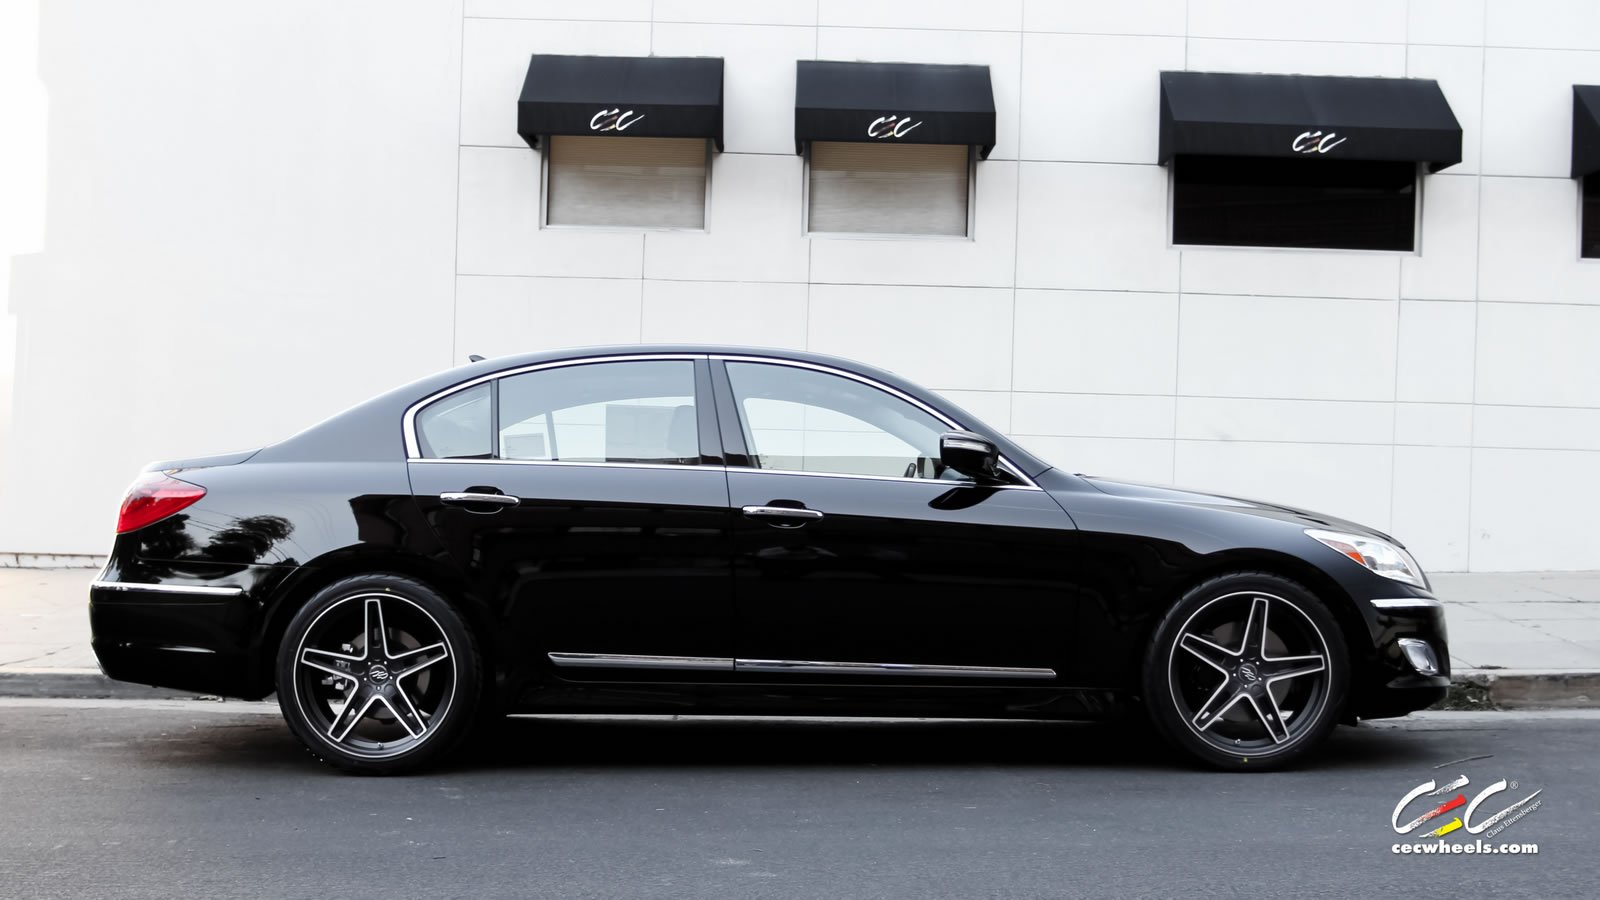 2015 cars cec tuning wheels hyundai genesis sedan black wallpaper 1600x900 625480 wallpaperup